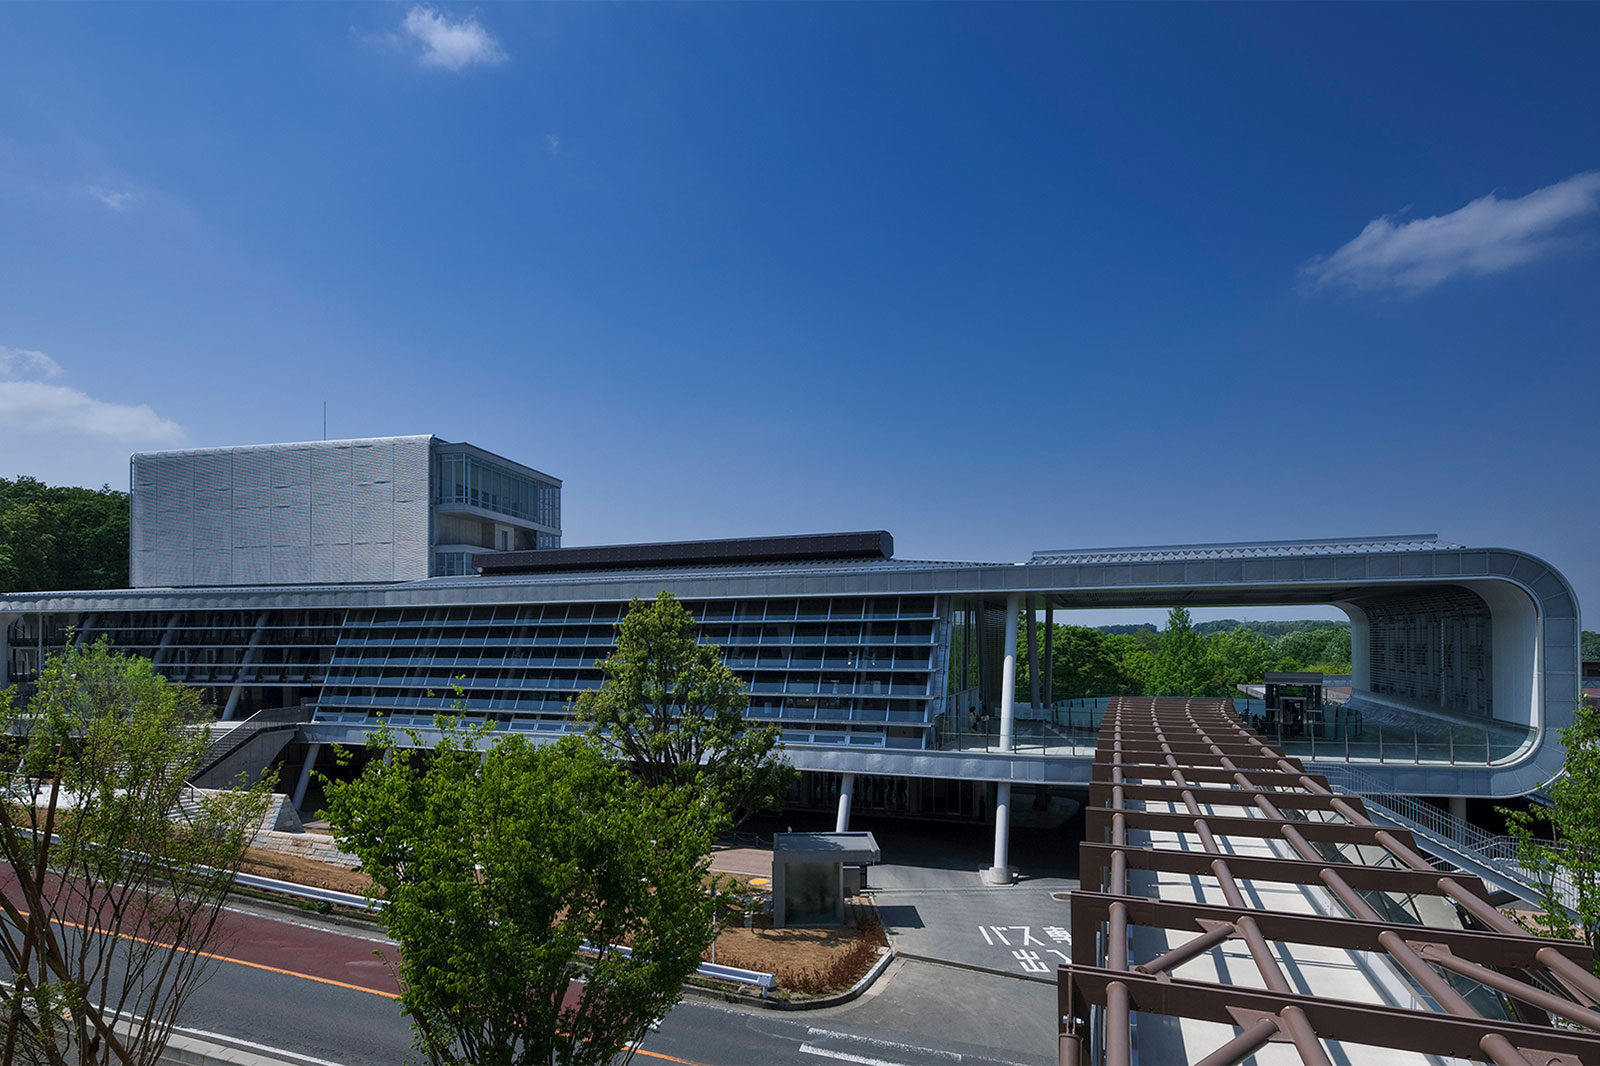 大東文化大学 東松山キャンパス5号館